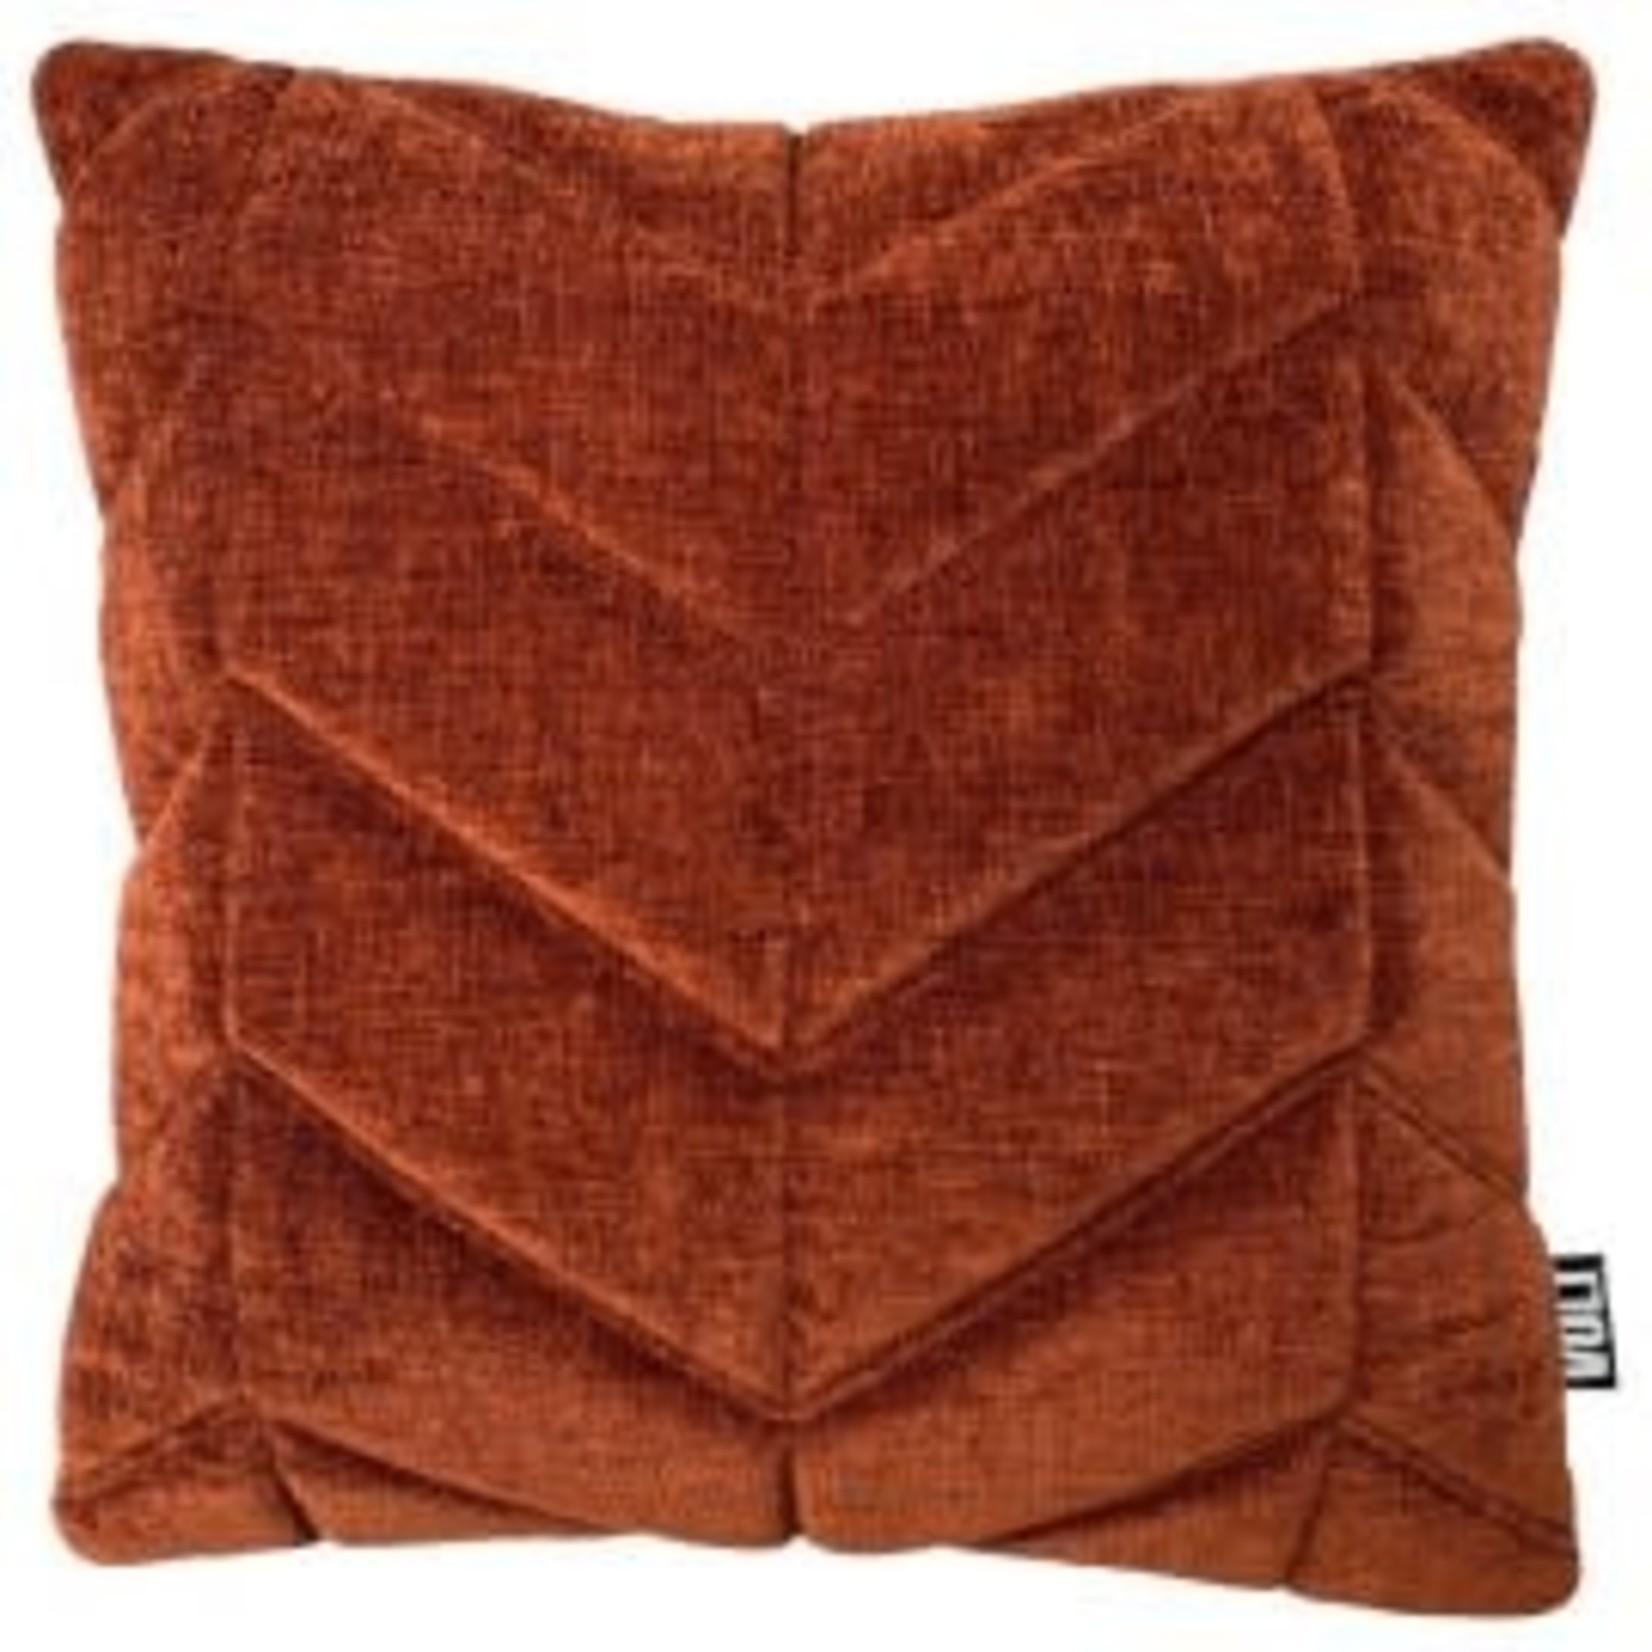 Volt Volt cushion 3D Fishbone velvet dark rust 45x45cm